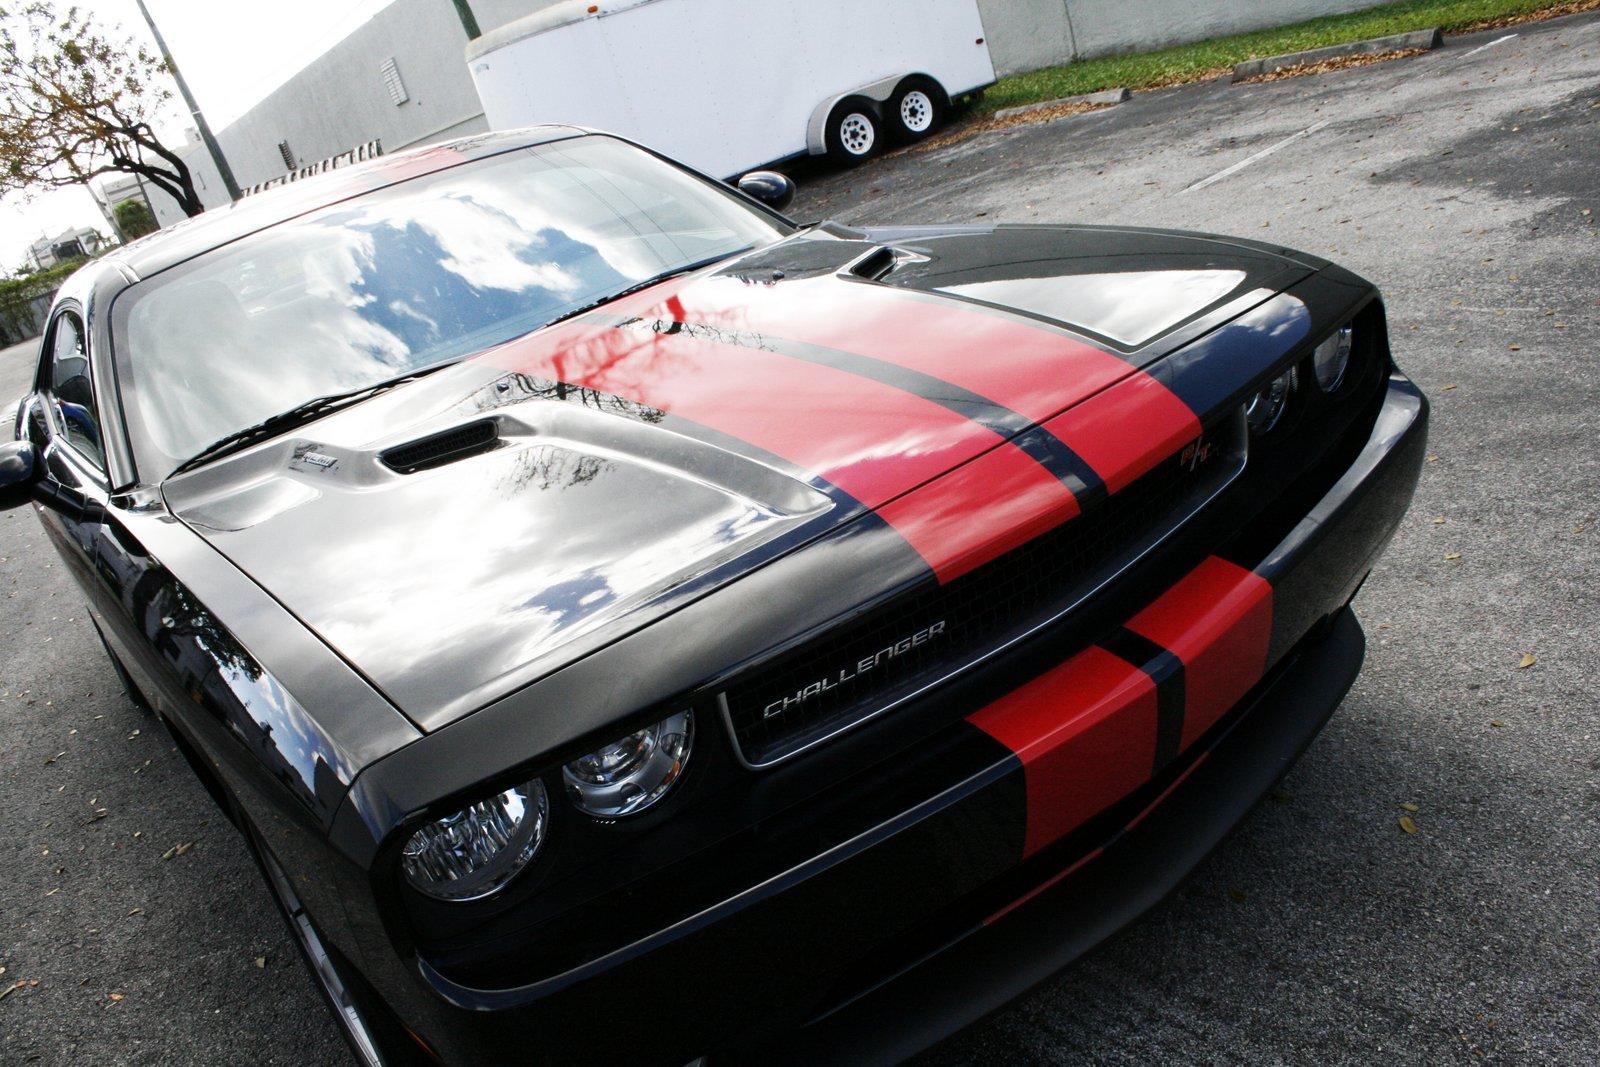 Car+racing+stripes